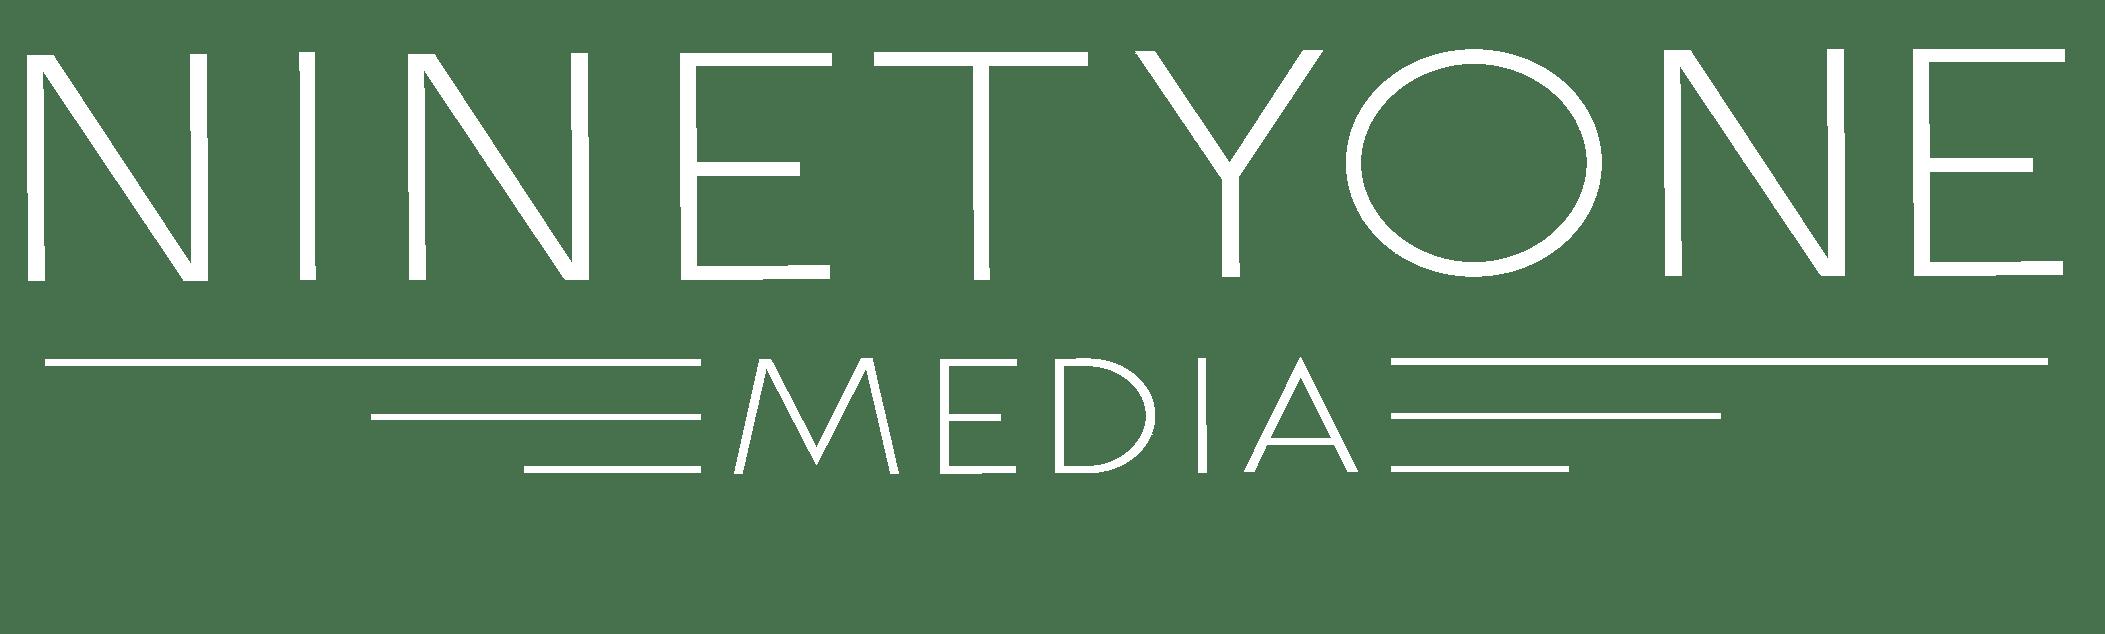 NINETYONE MEDIA